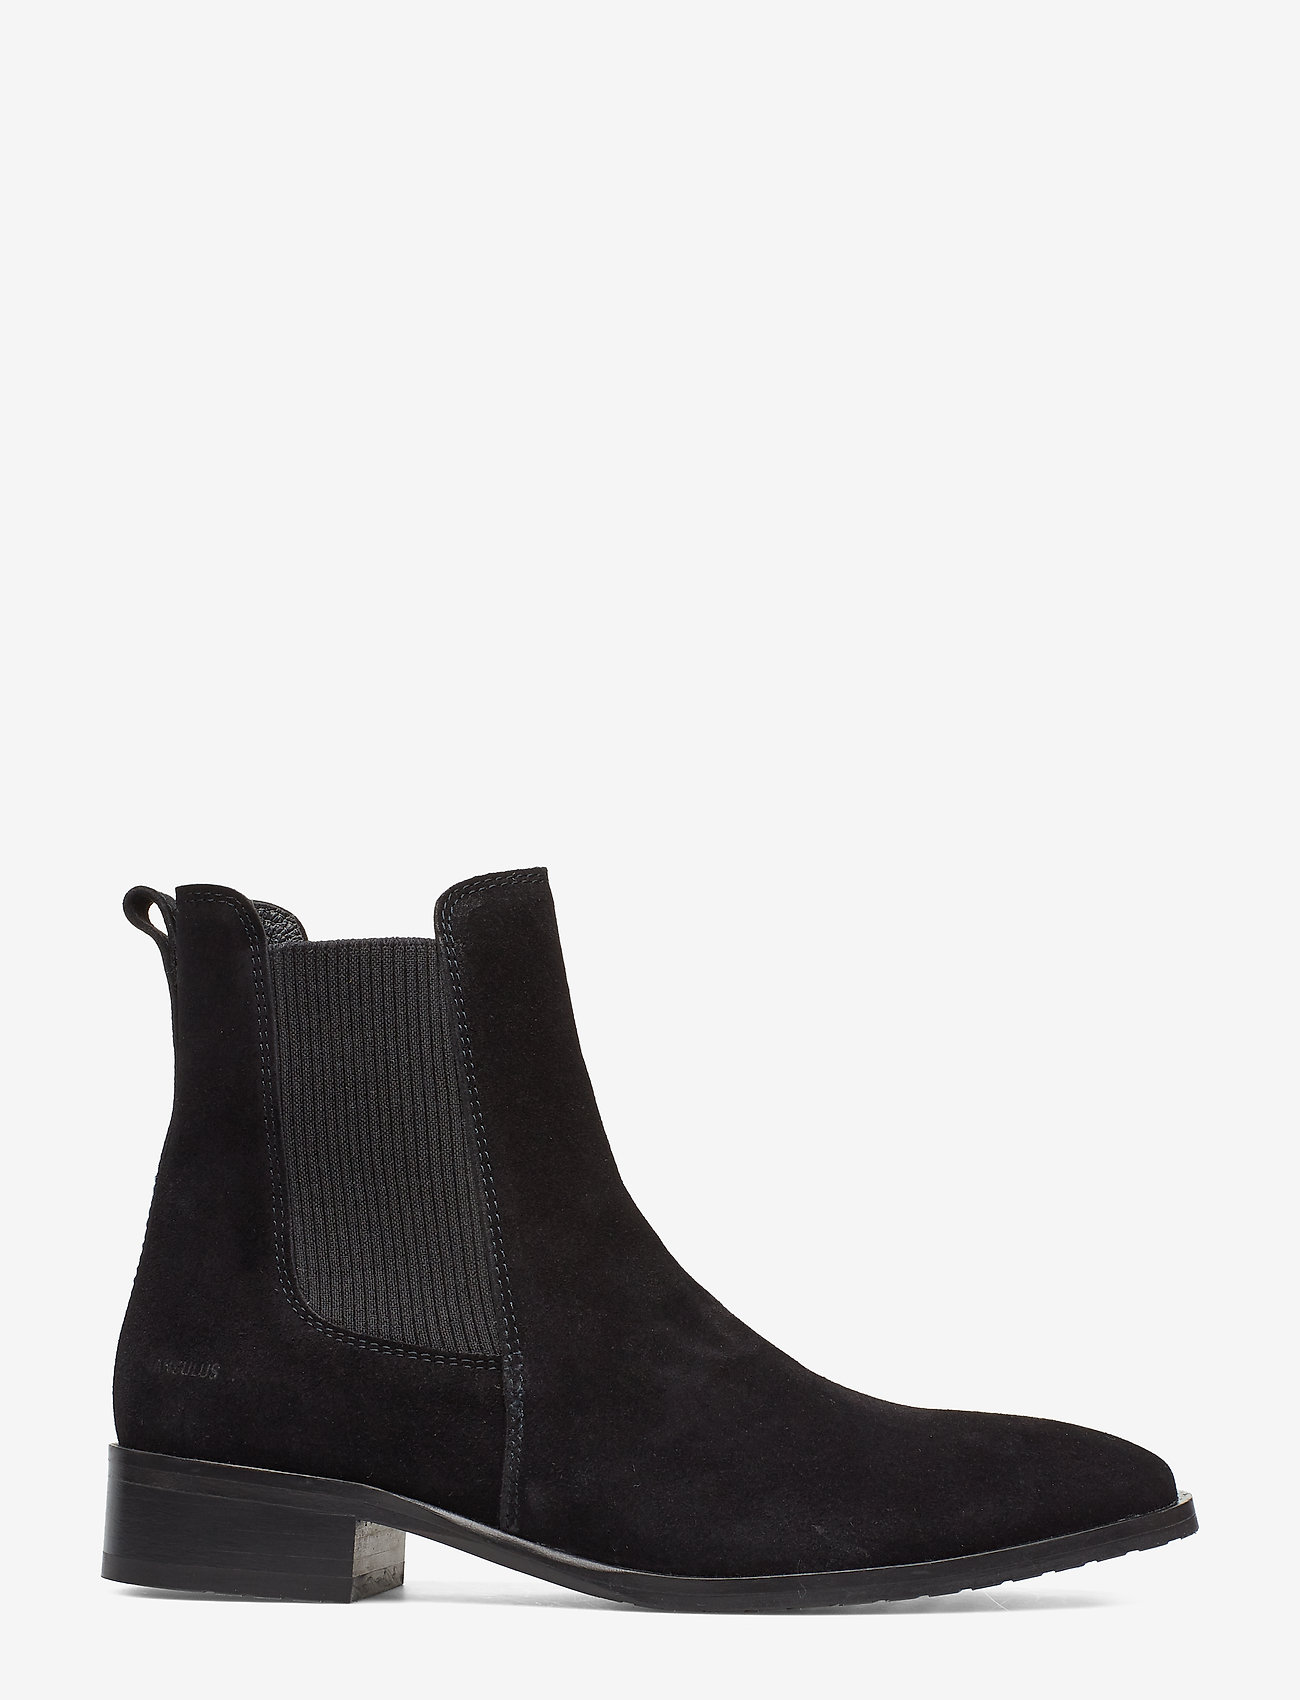 Booties - Flat - With Elastic (1163/019 Black/black) - ANGULUS gqzqNZ